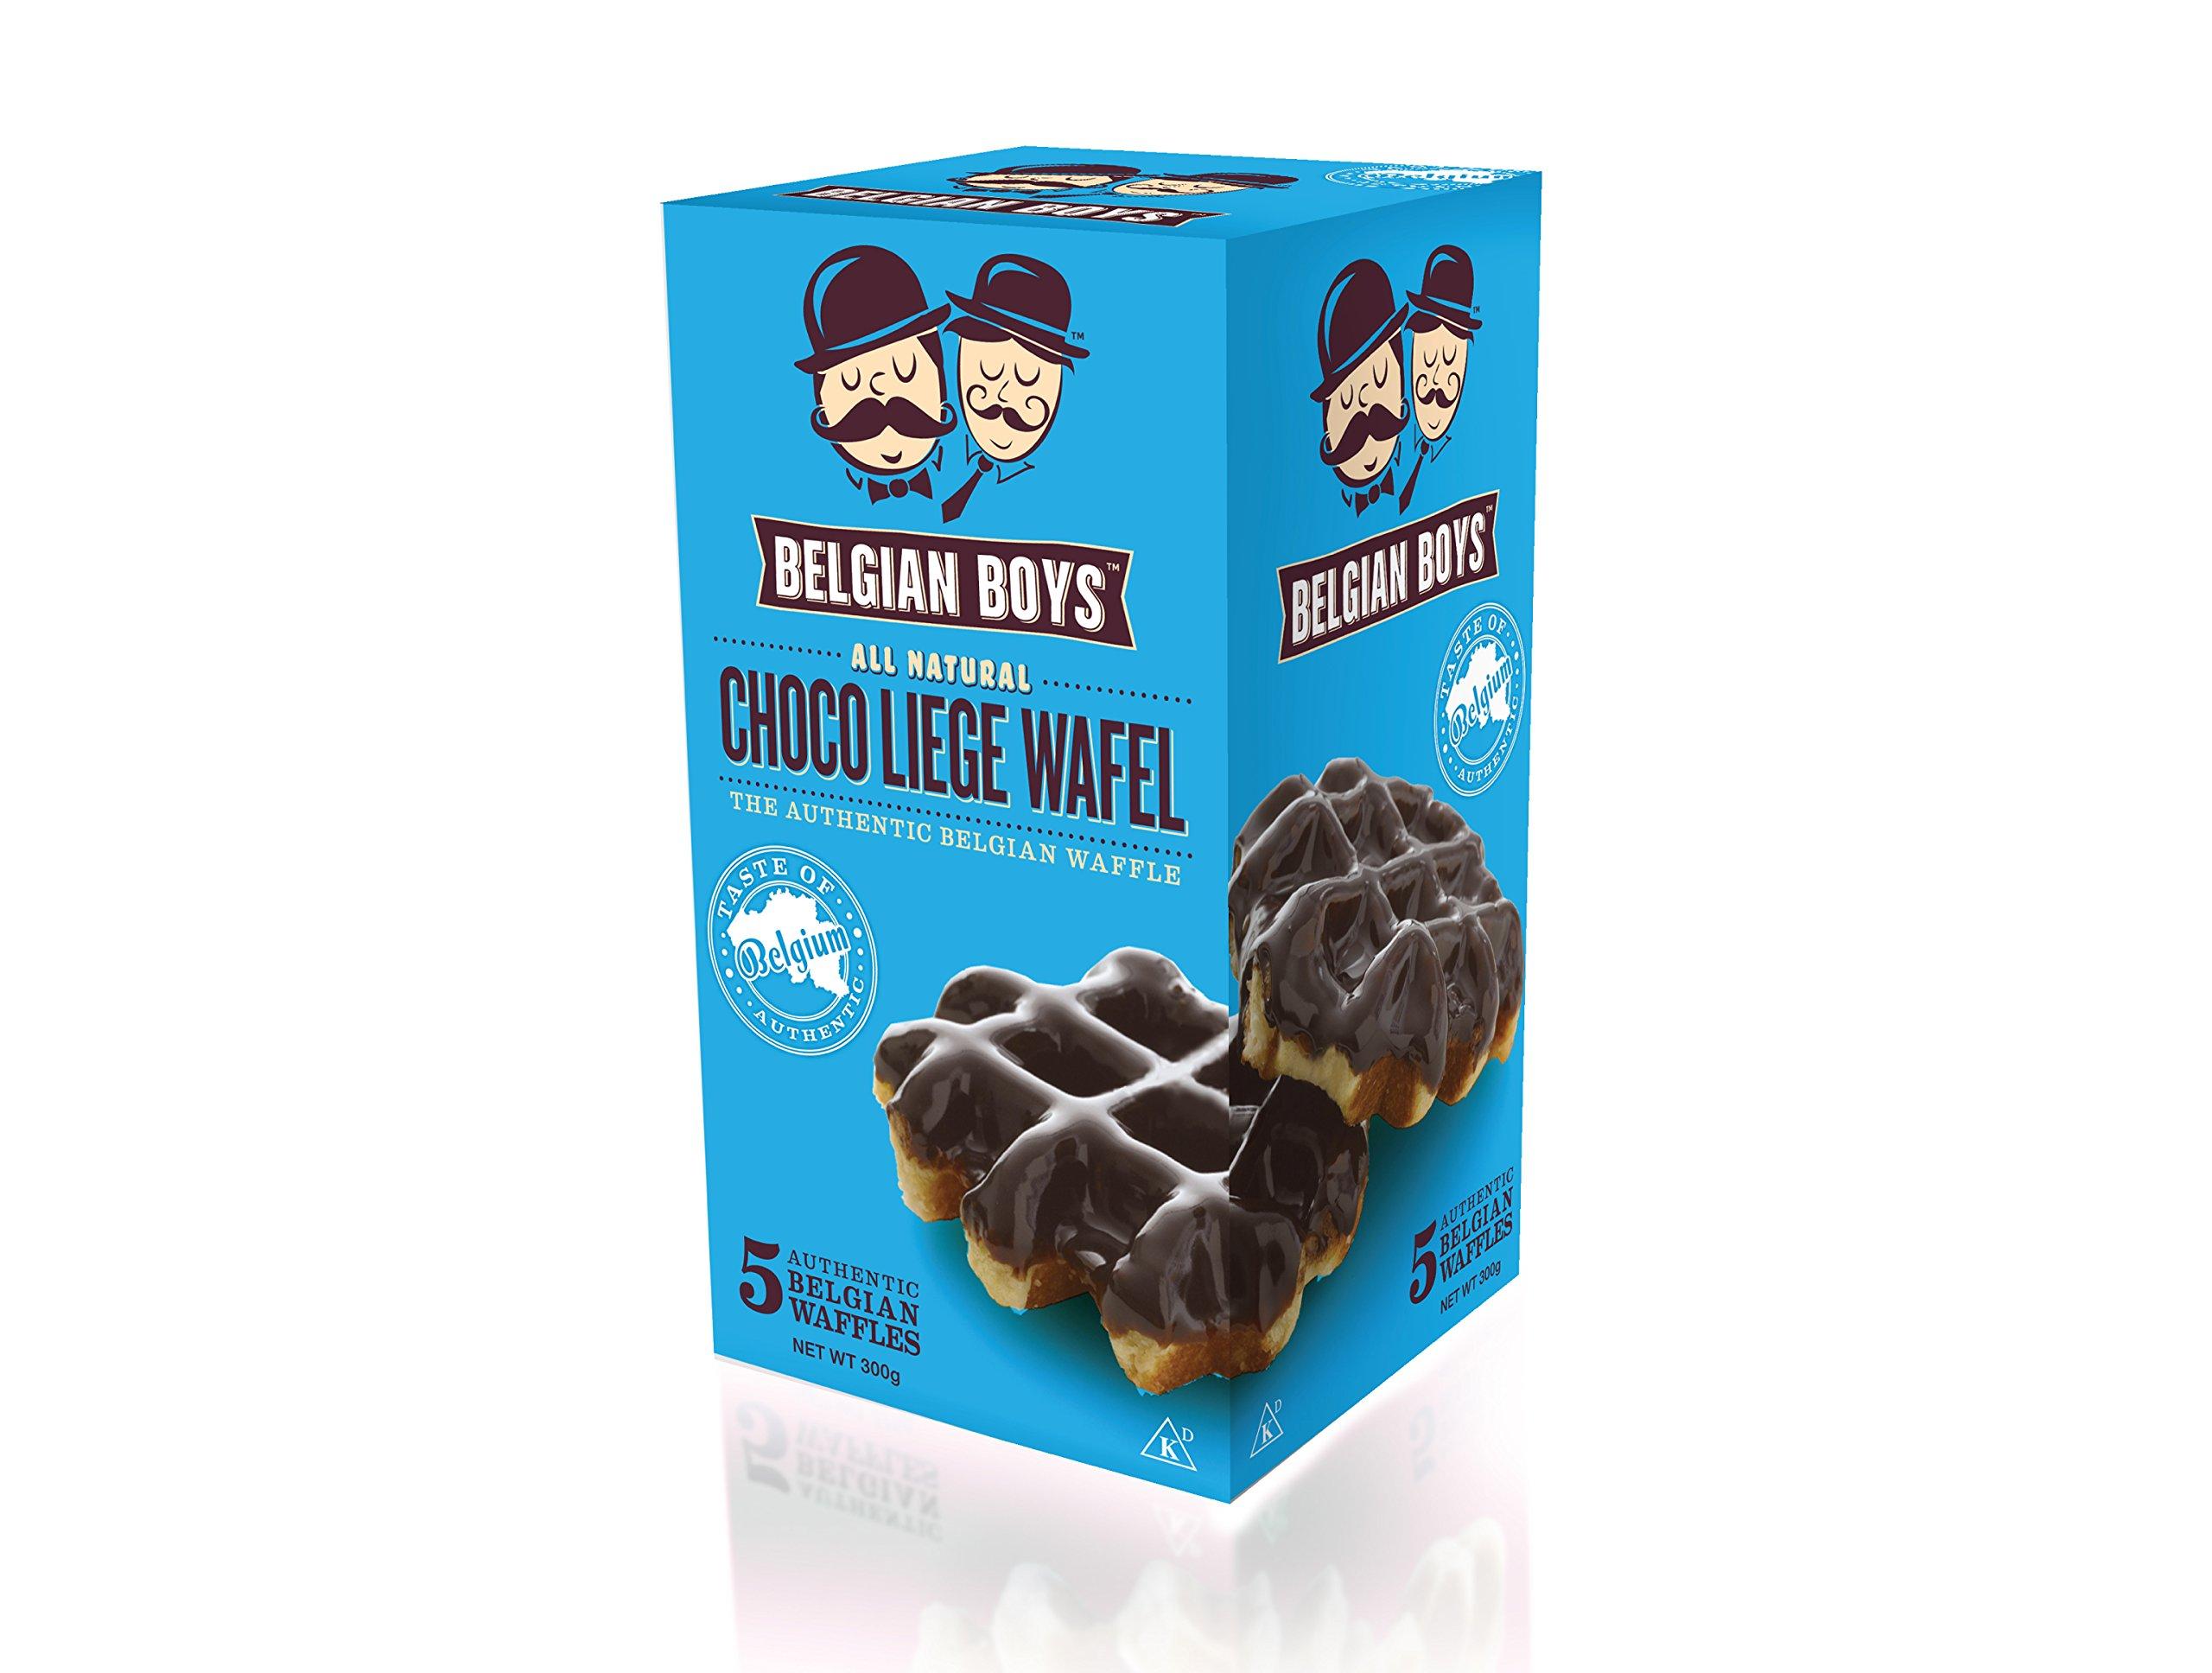 Belgian Boys Choco De Liege Wafel, 2.11 Ounce (Pack of 5)